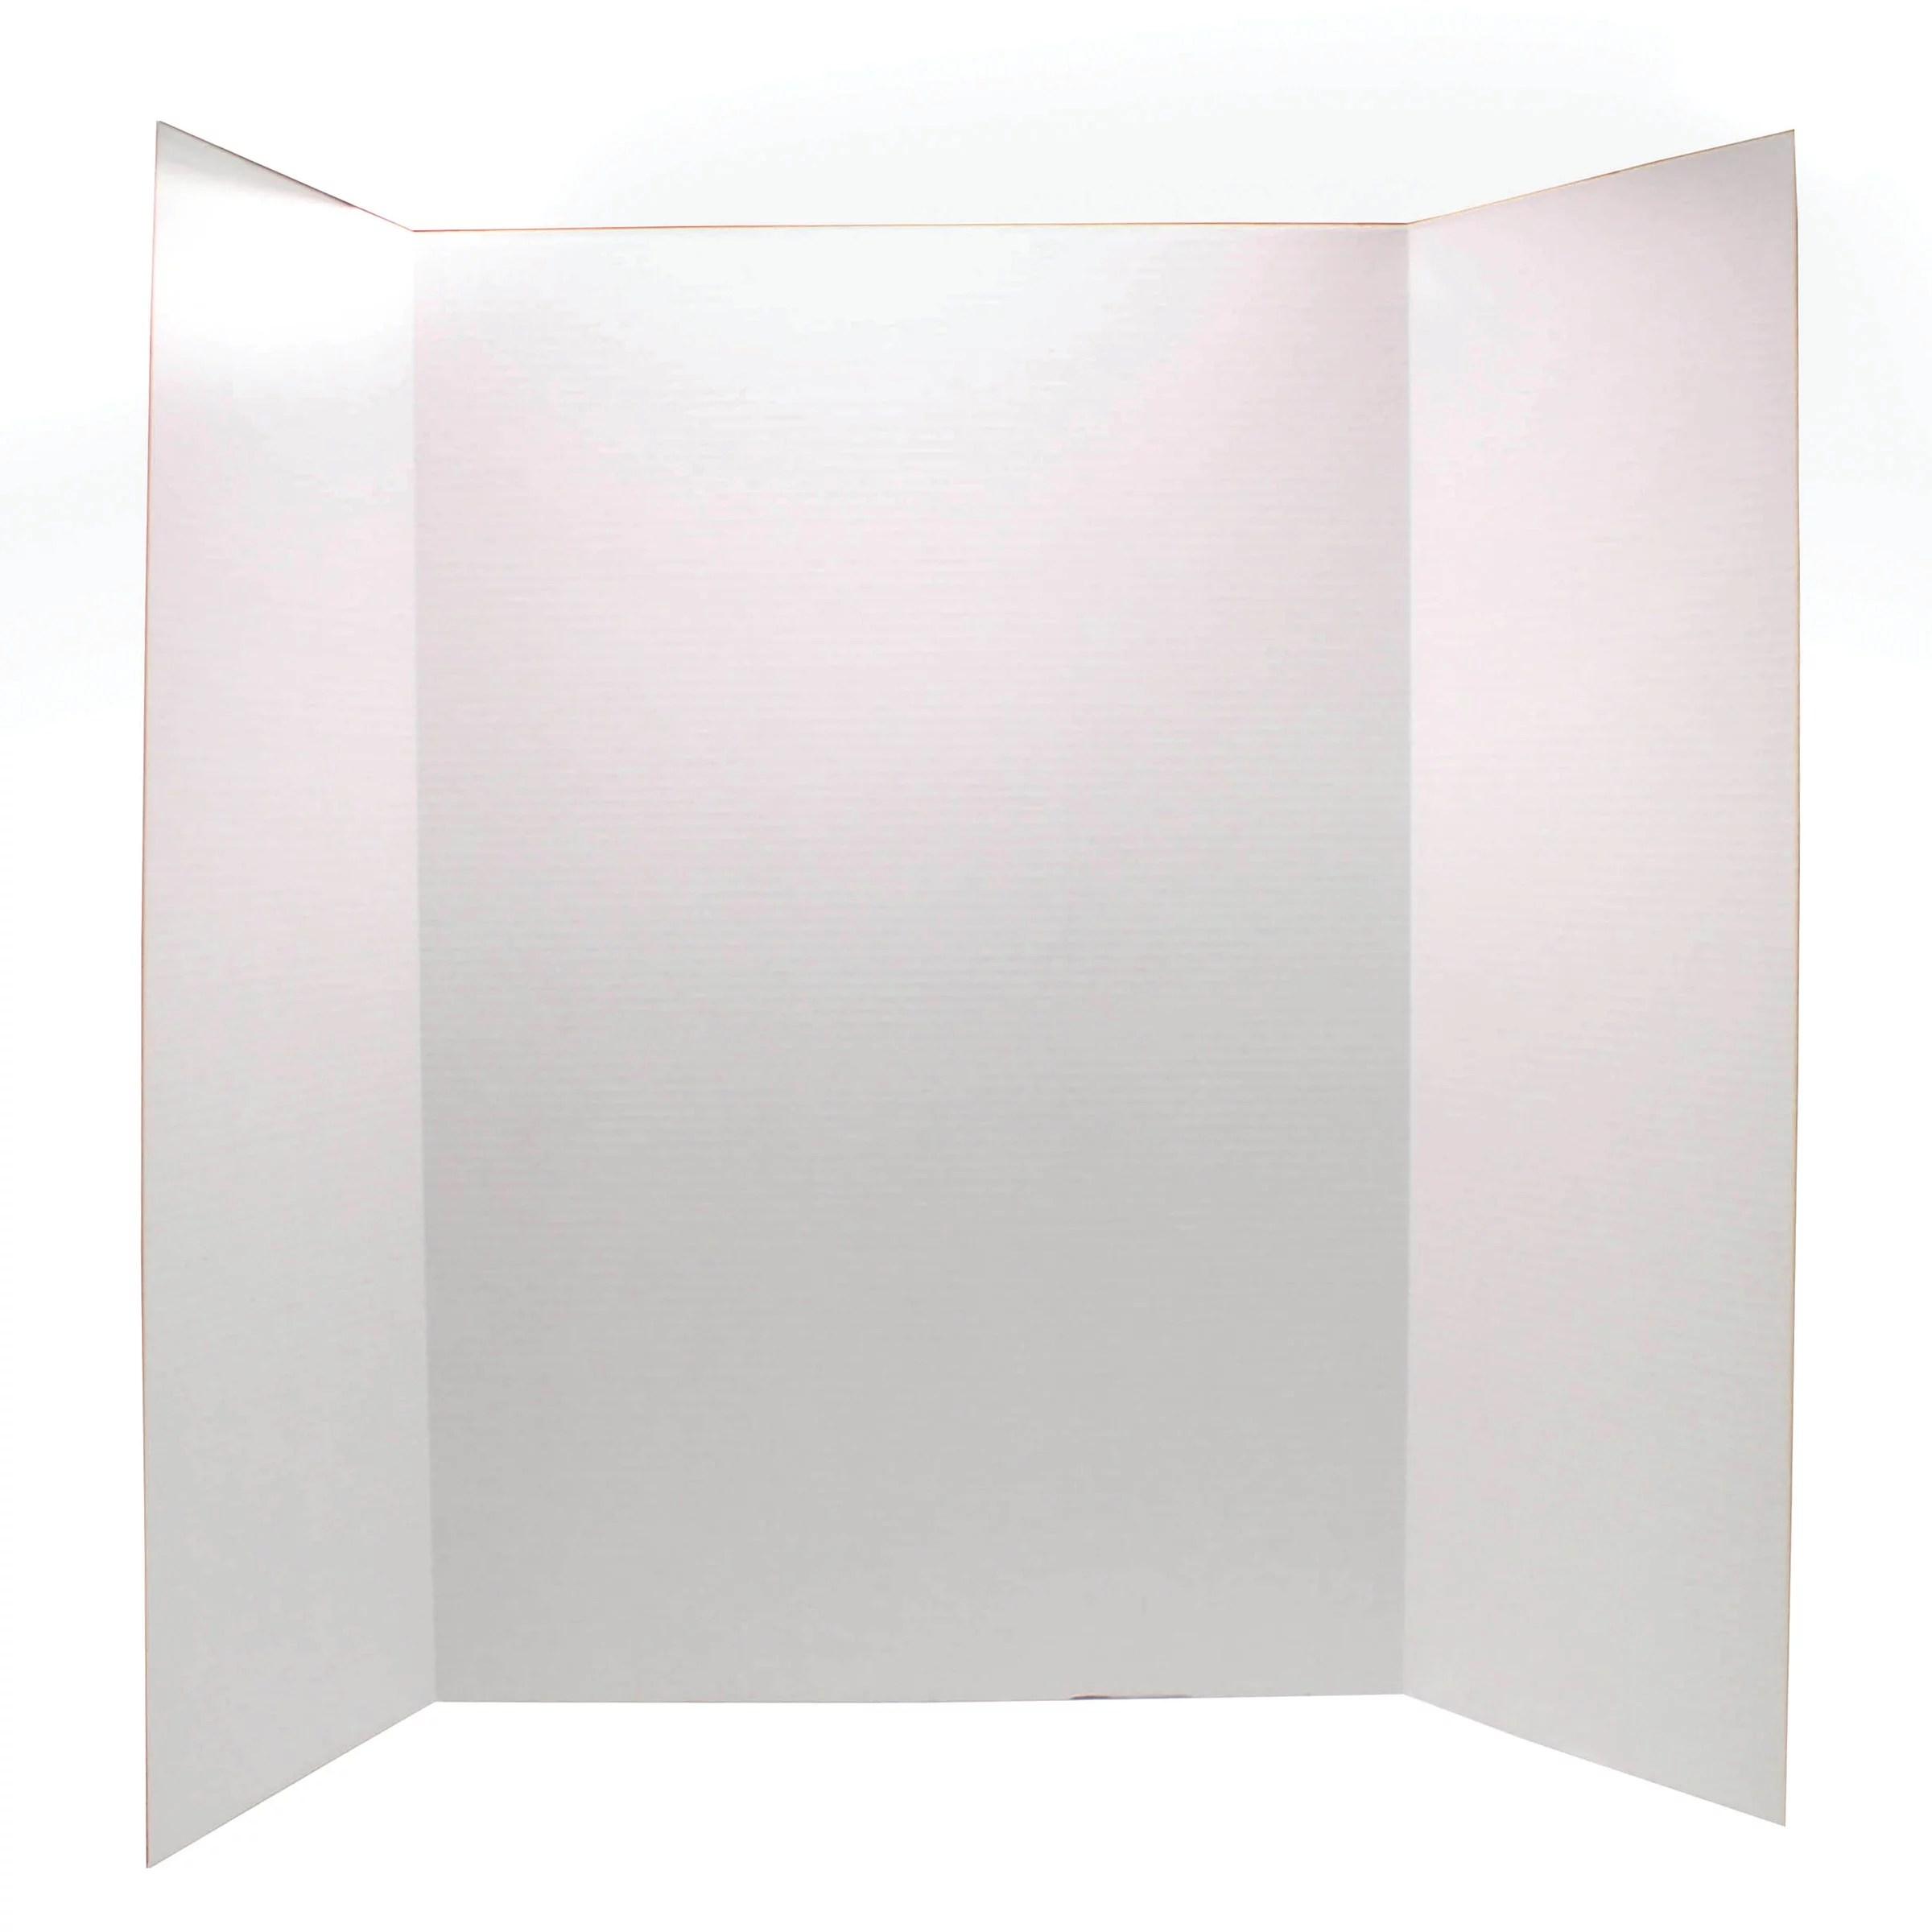 ucreate 36 x 48 white tri fold corrugate presentation board